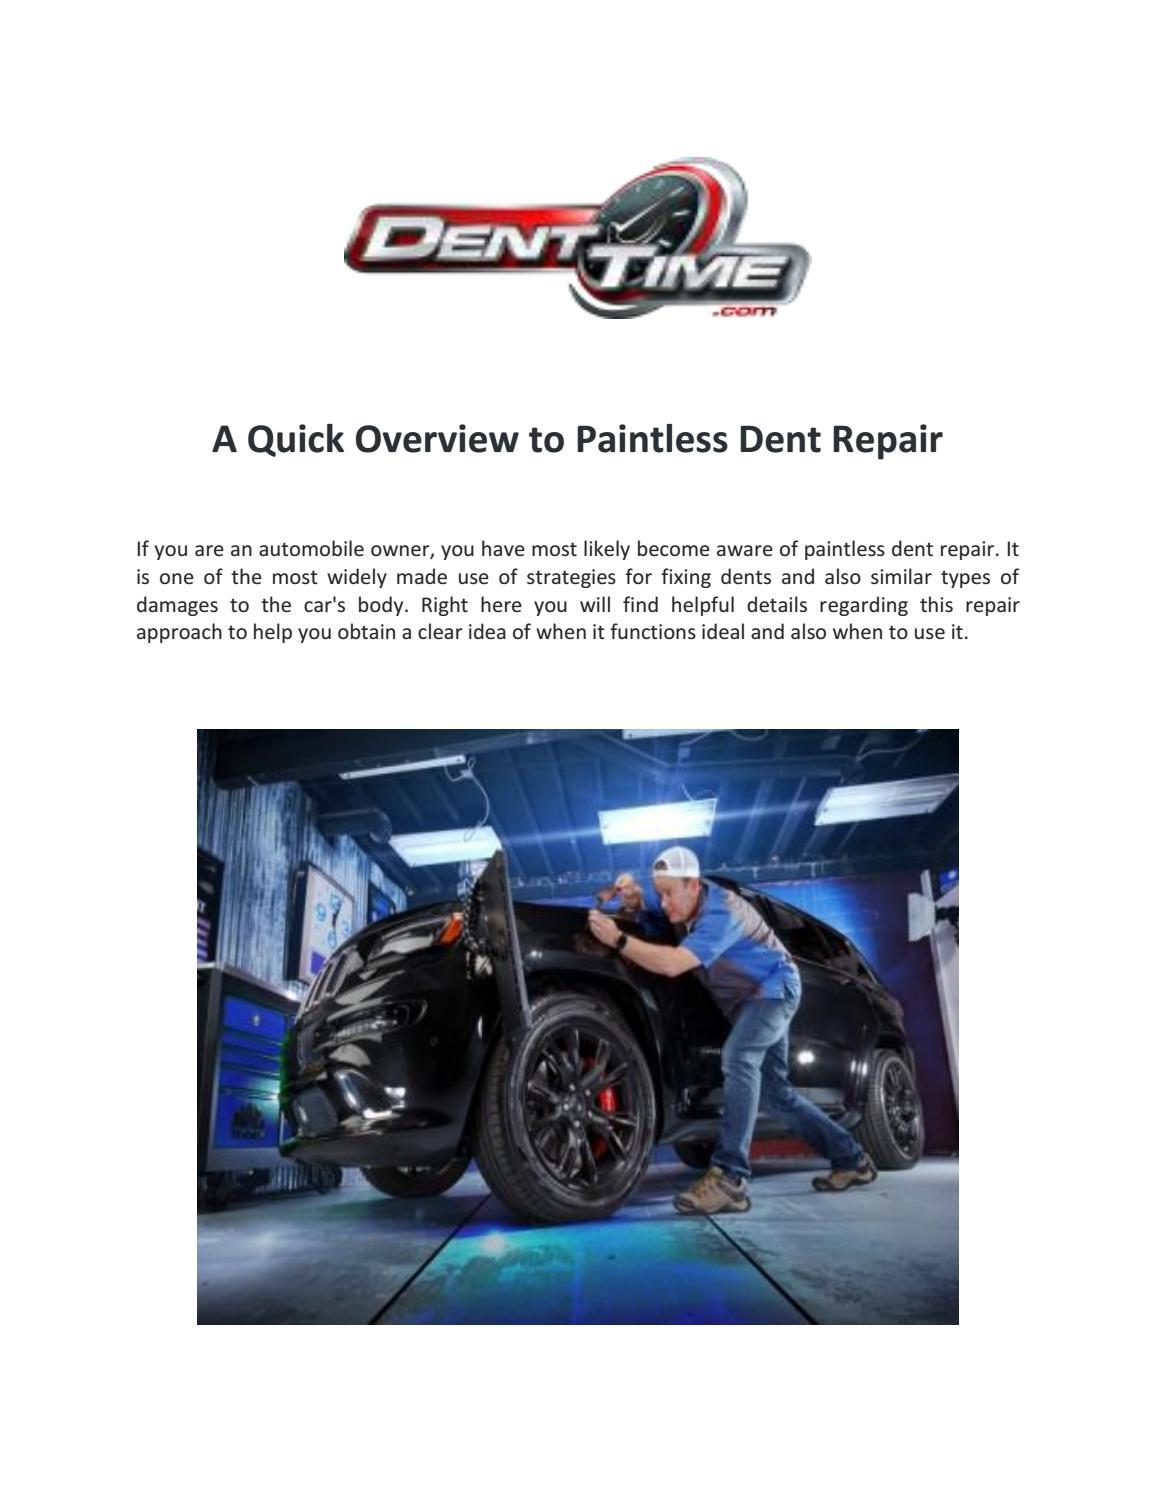 Paintless Dent Removal San Diego Bumper Scratch Repair